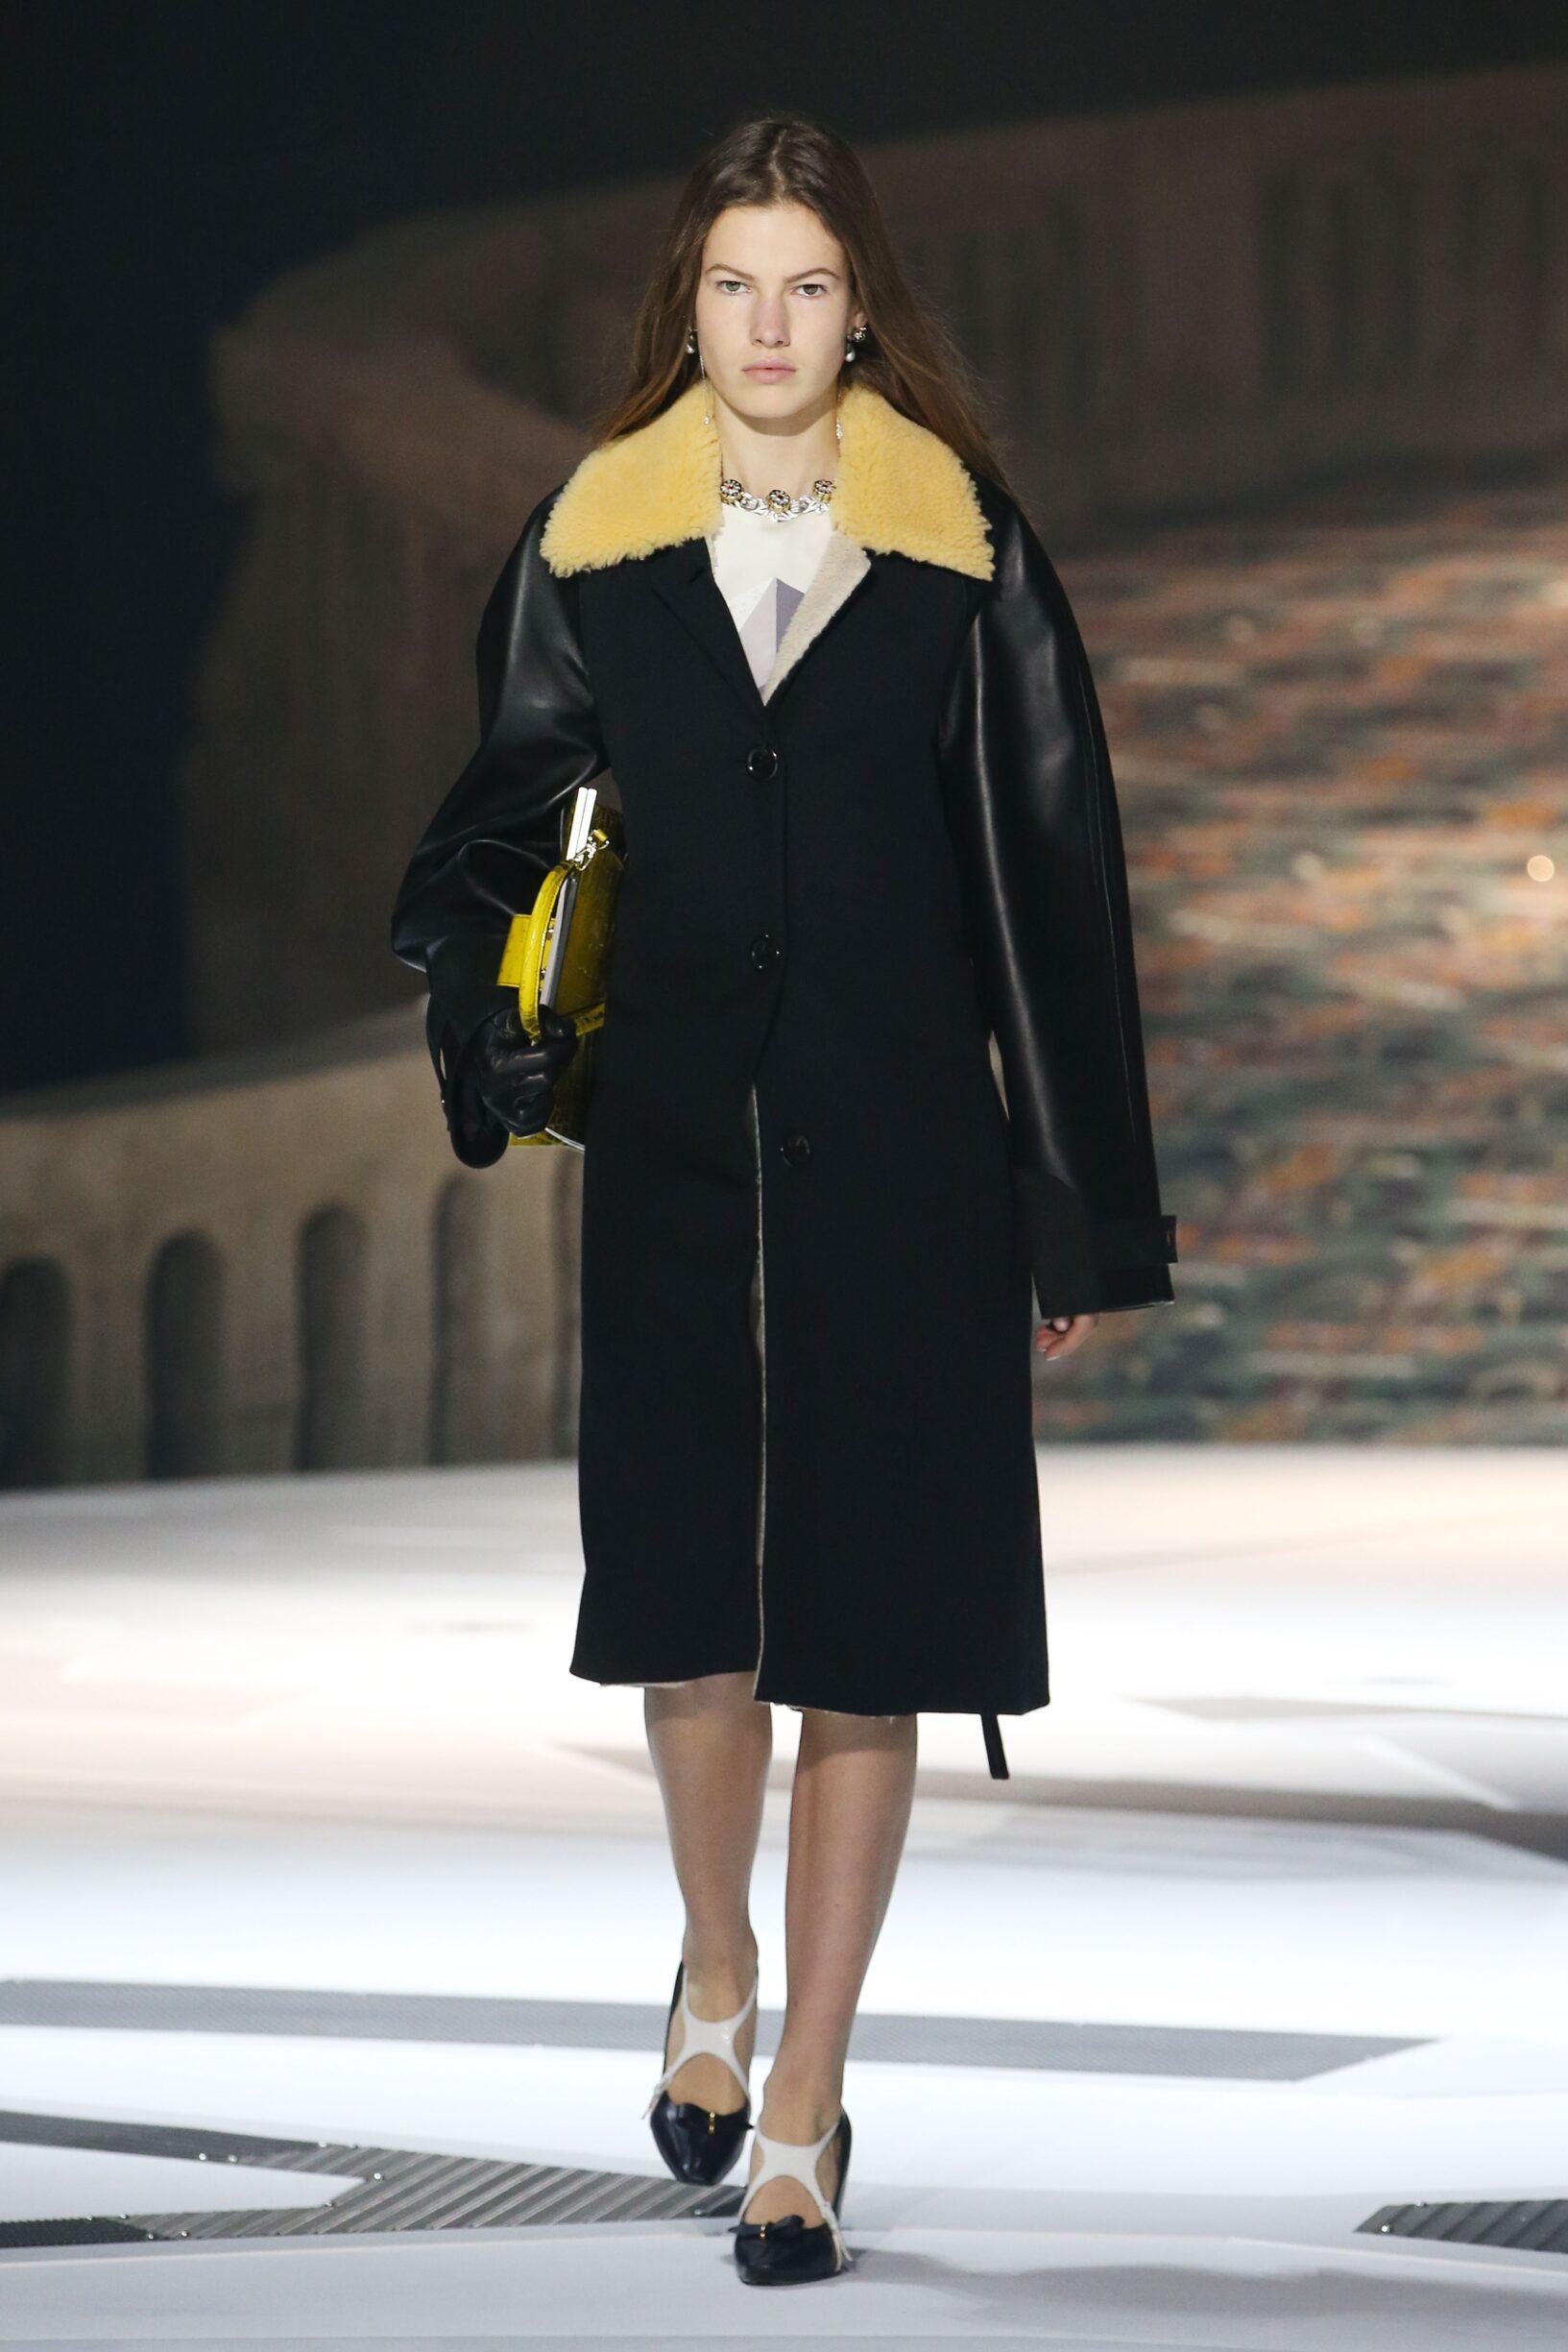 Louis Vuitton FW 2018 Womenswear